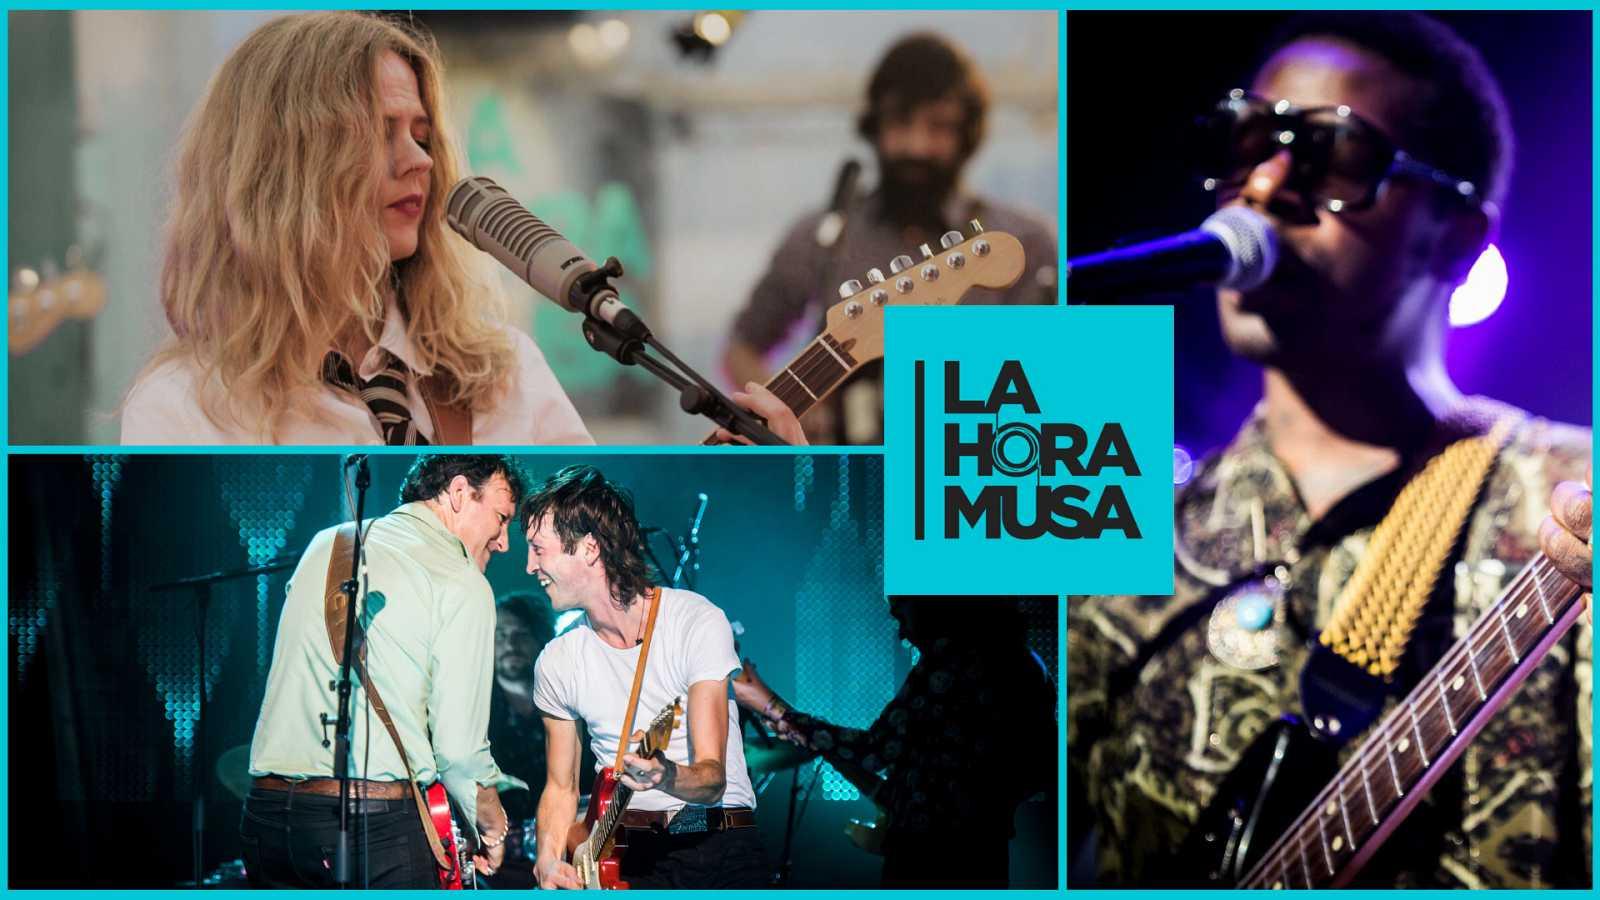 Extras Verano La Hora Musa - Christina Rosenvinge, Marlon Williams y Curtis Harding